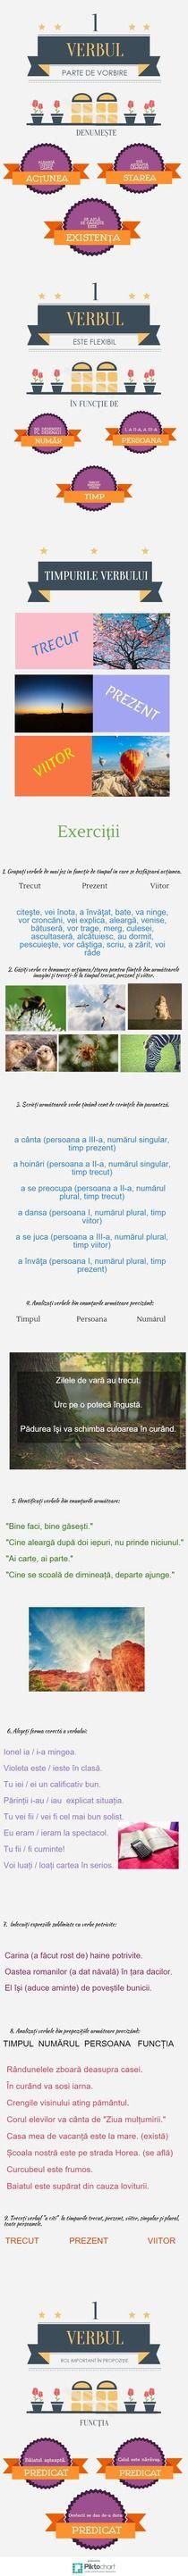 verbul | Piktochart Infographic Editor